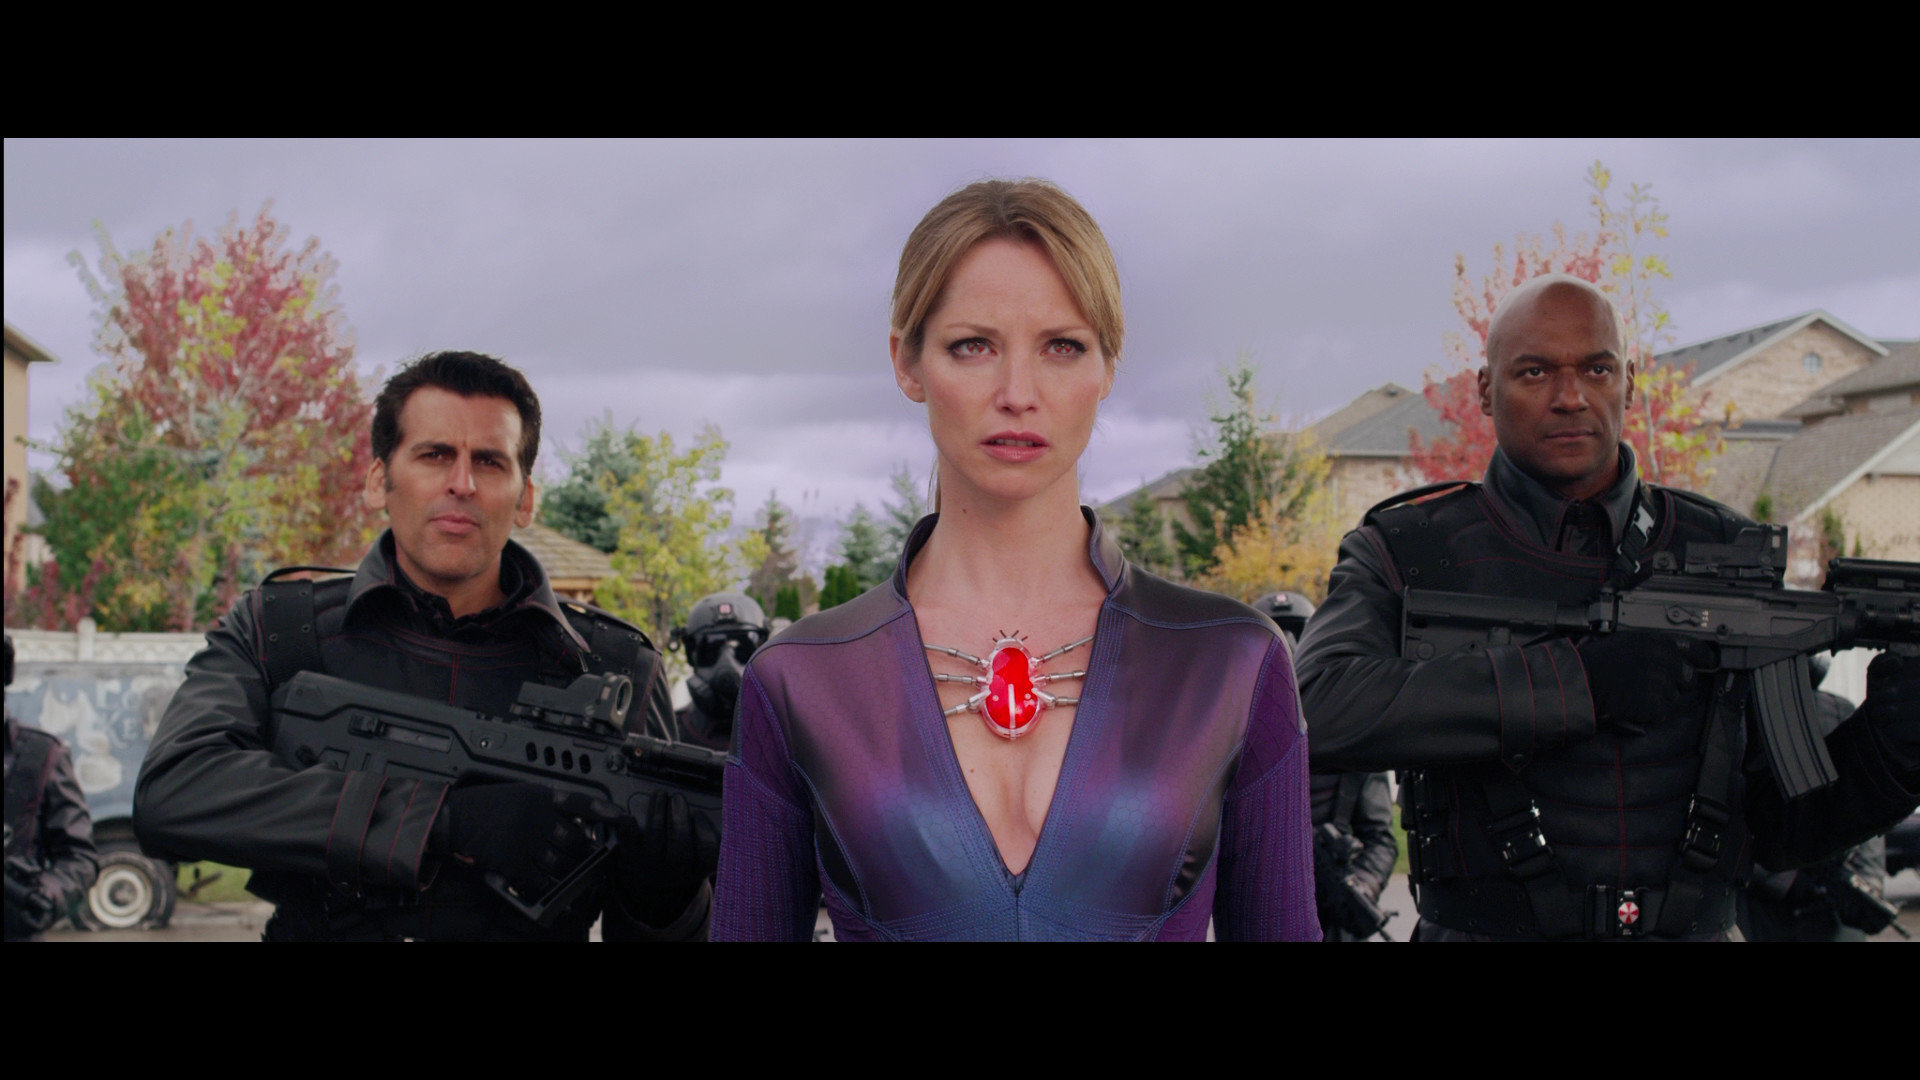 Download movie resident evil retribution mp4.